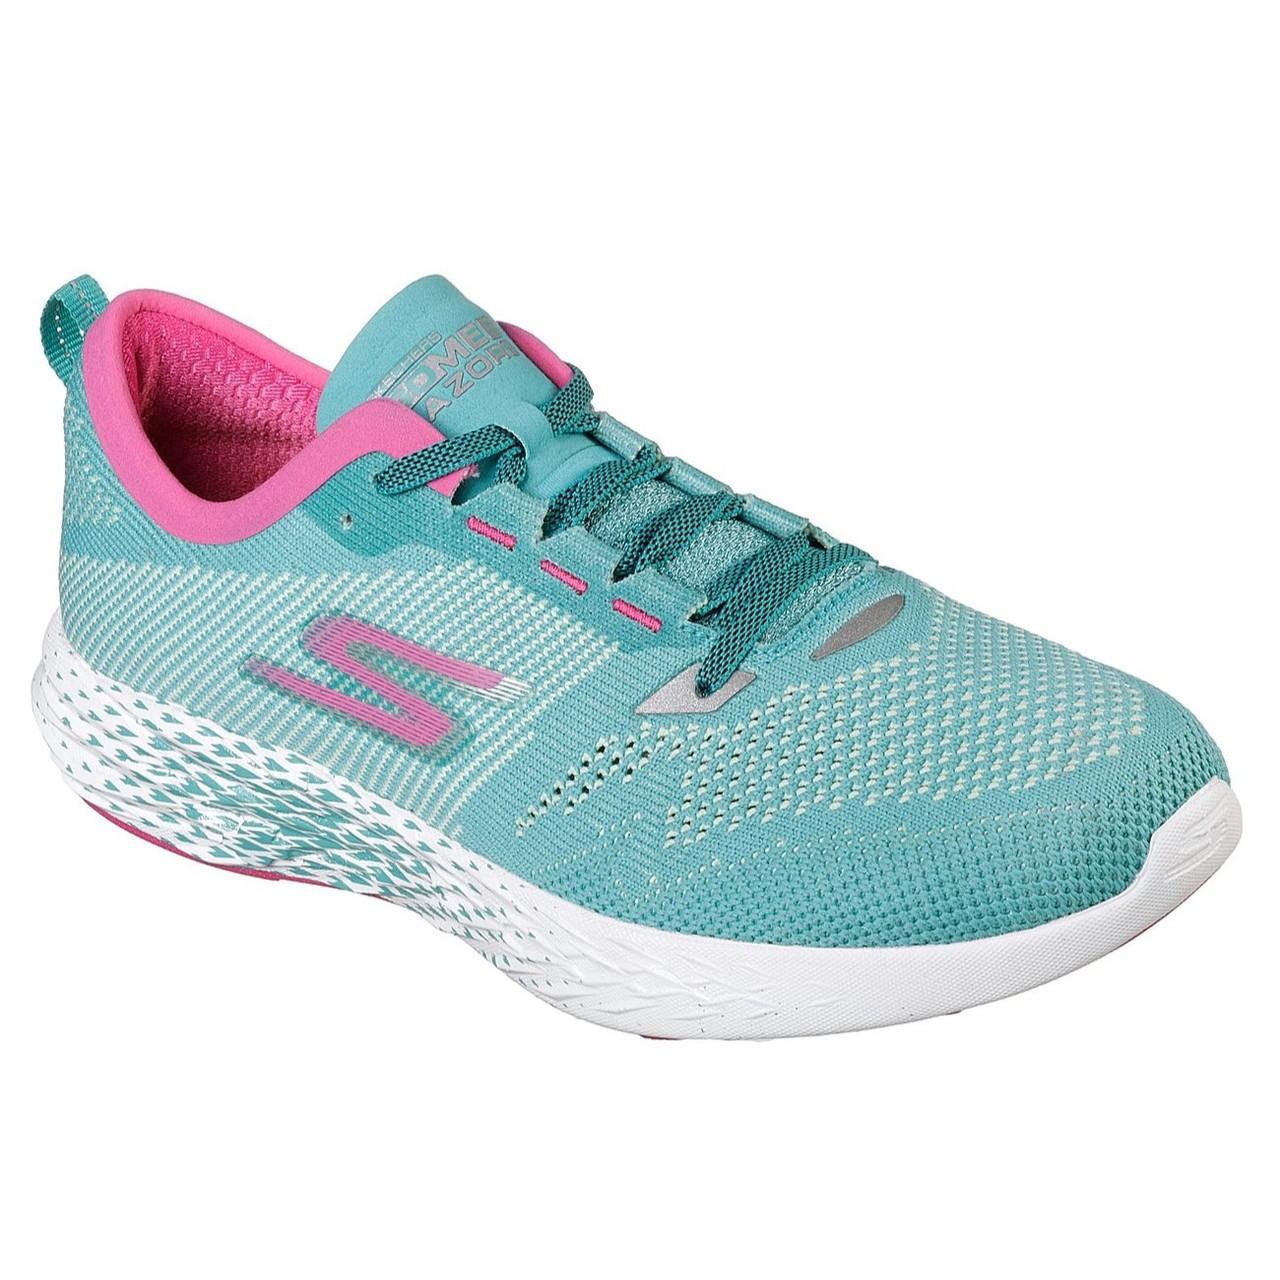 Skechers Women's Go Meb Razor 2 Run Shoe - 2018 price